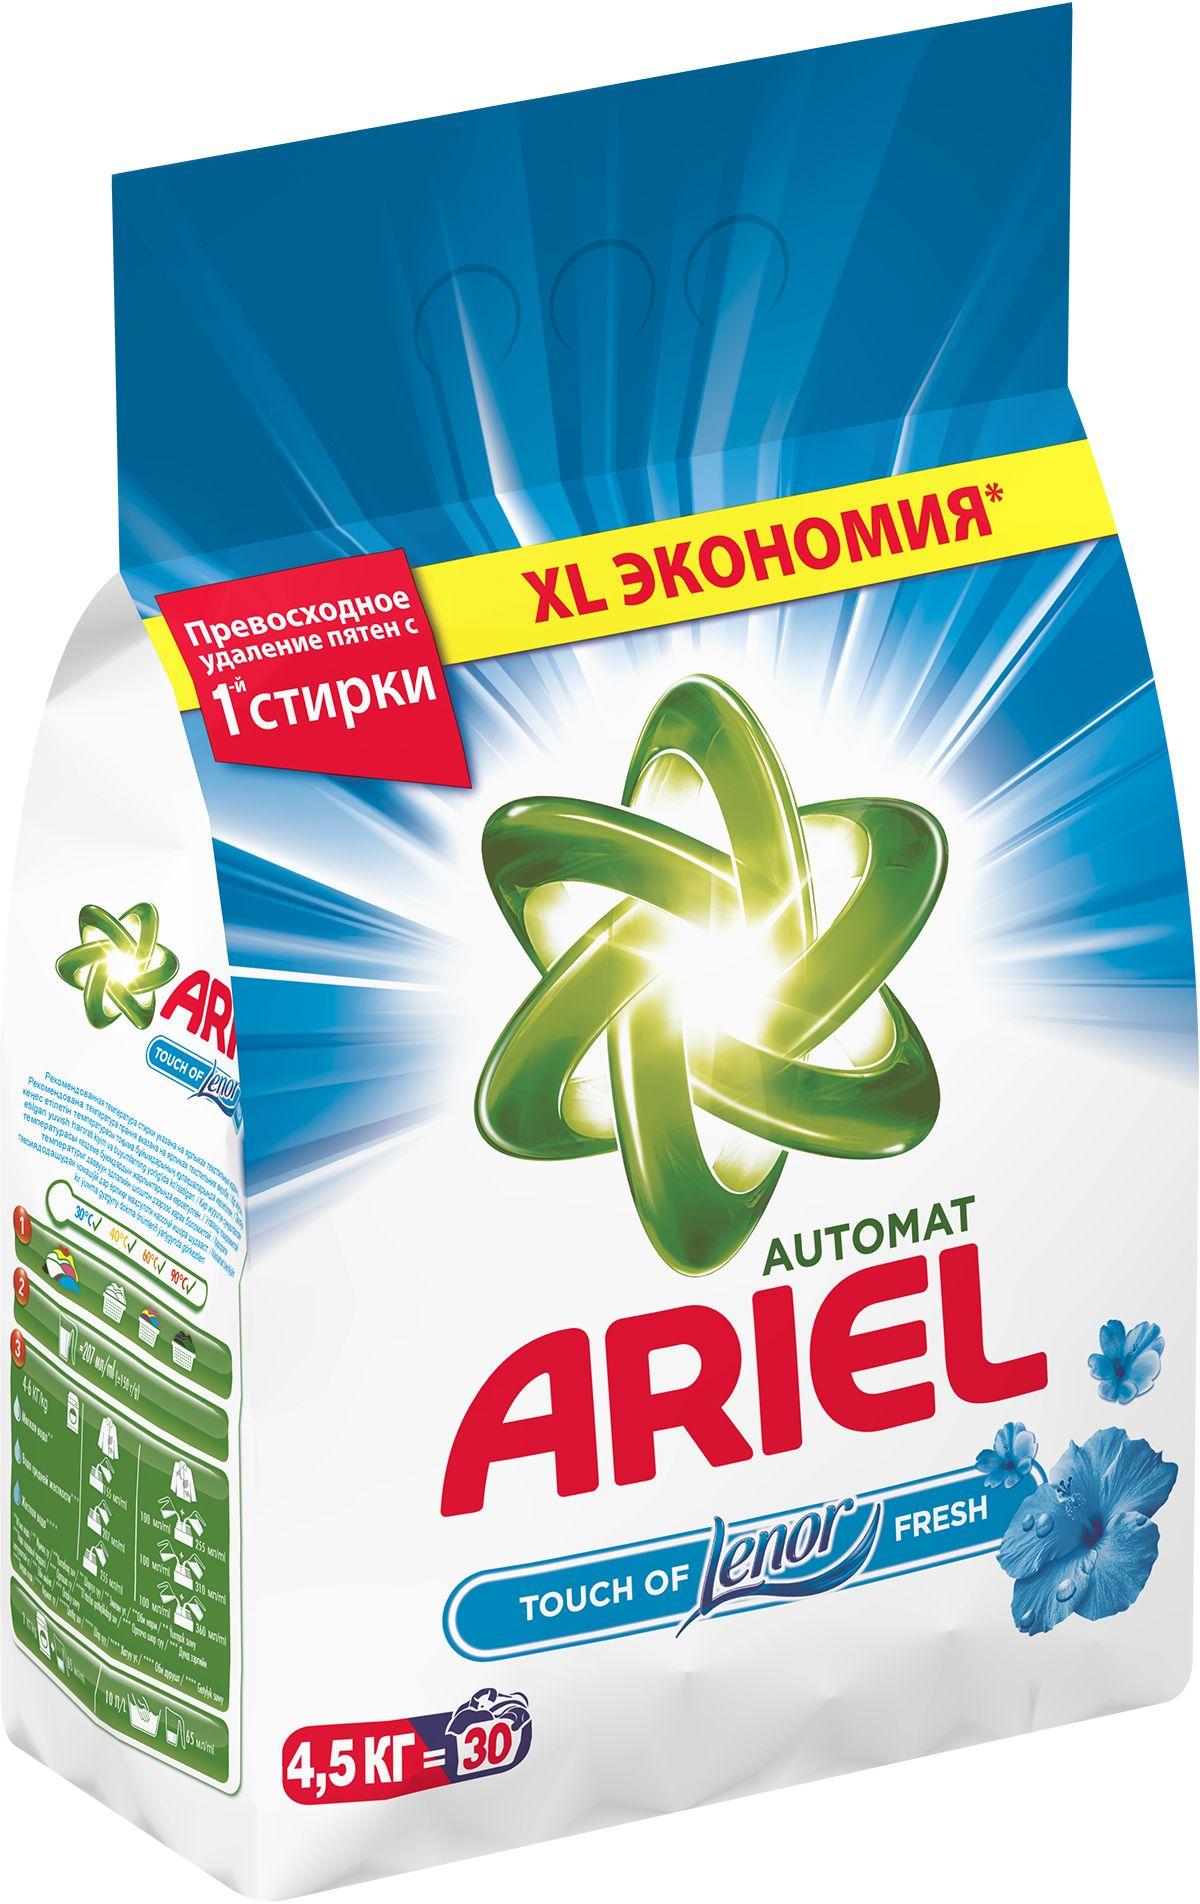 ariel ARIEL 2в1 Lenor Effect 4,5 кг Автомат (5413149601383)